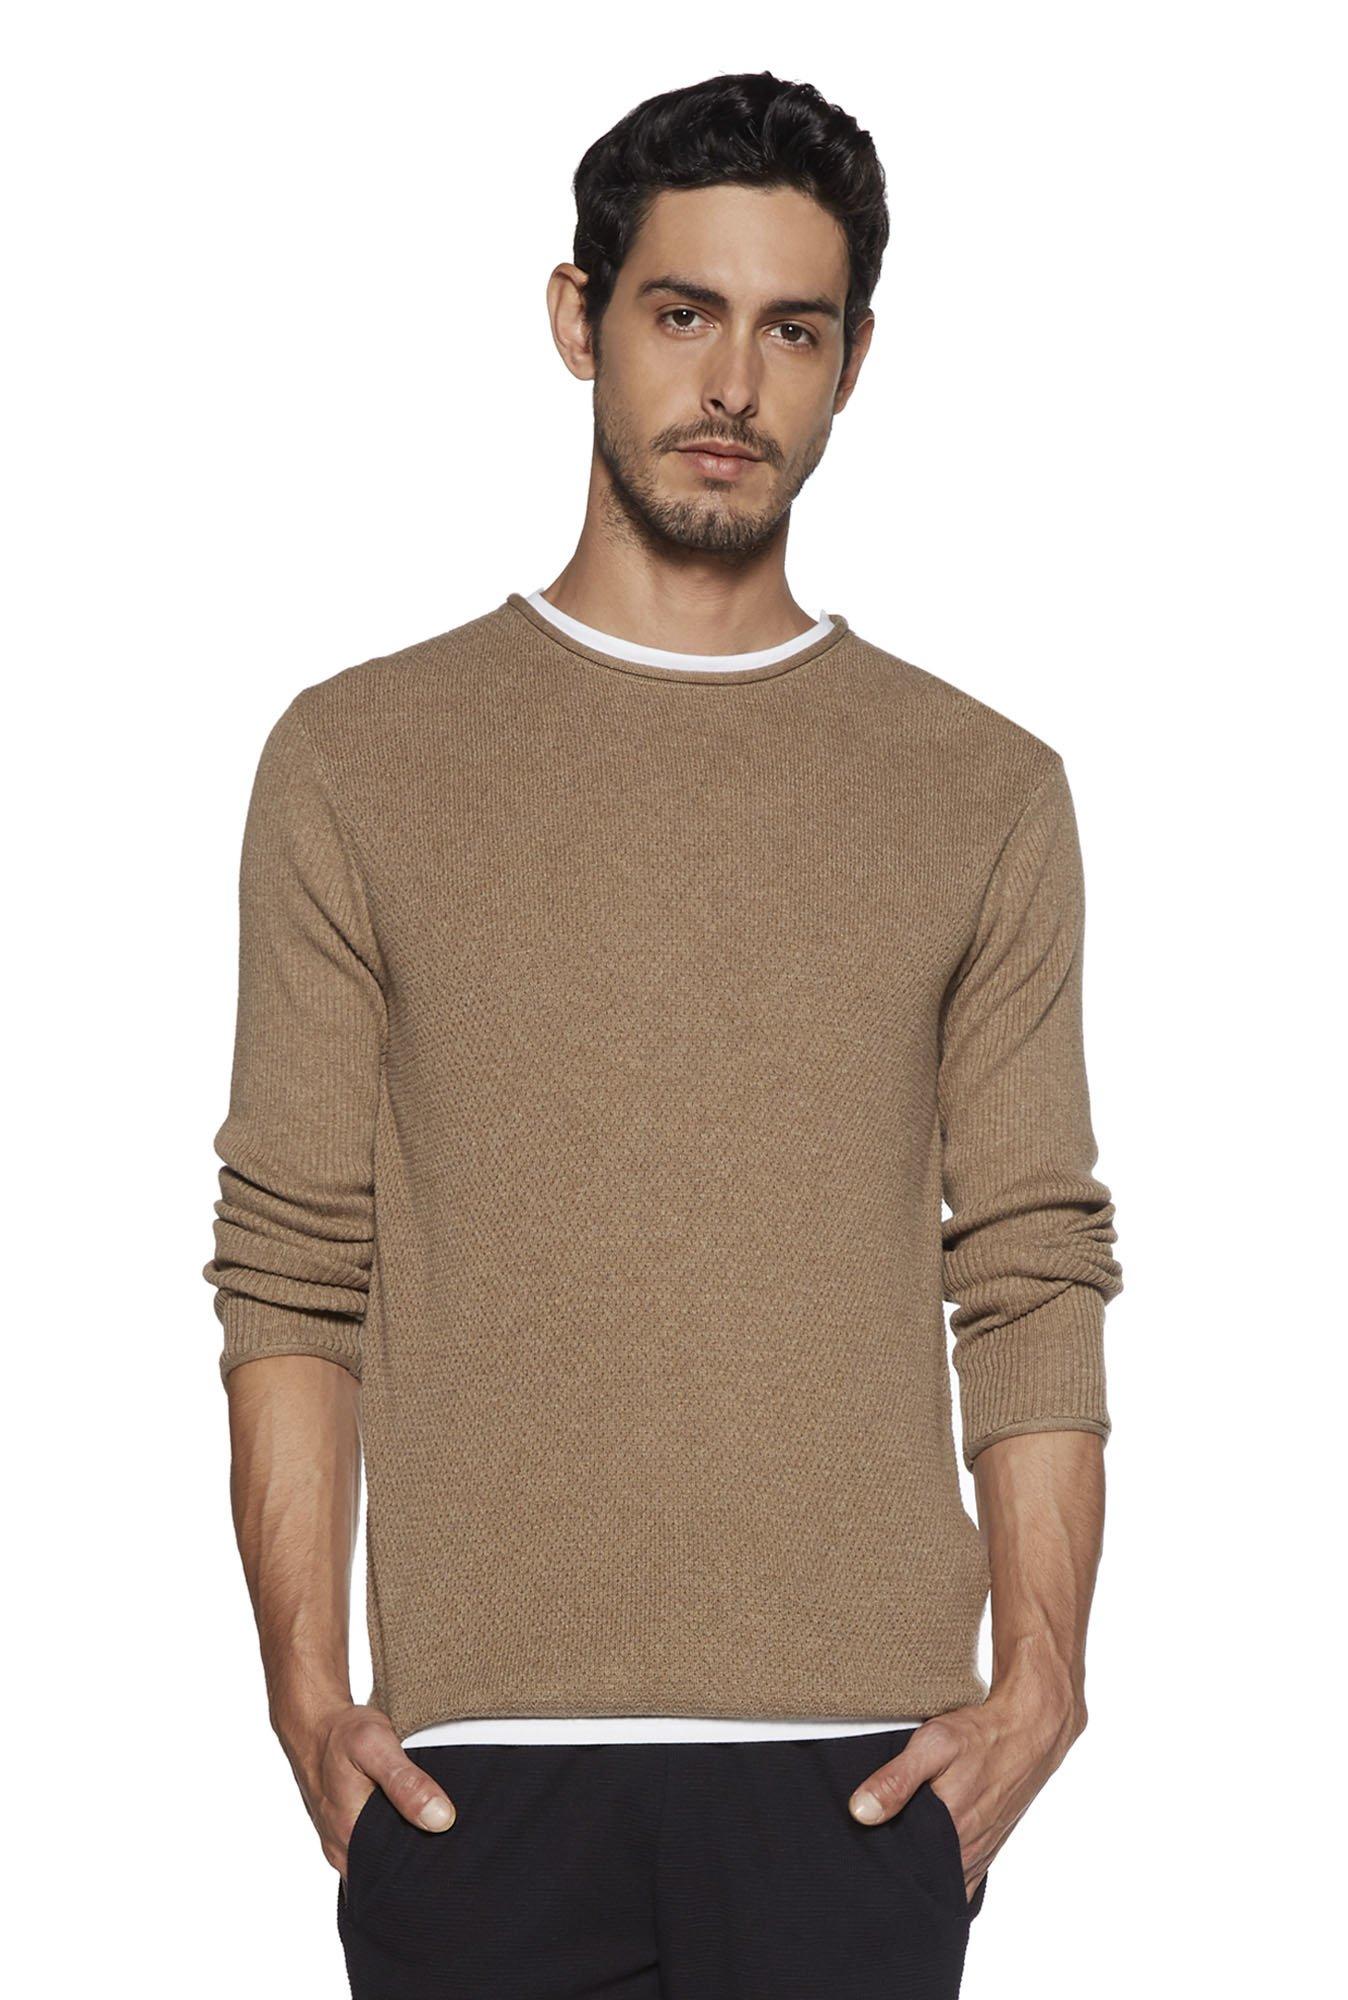 ETA by Westside Khaki Knitted Slim Fit T-Shirt